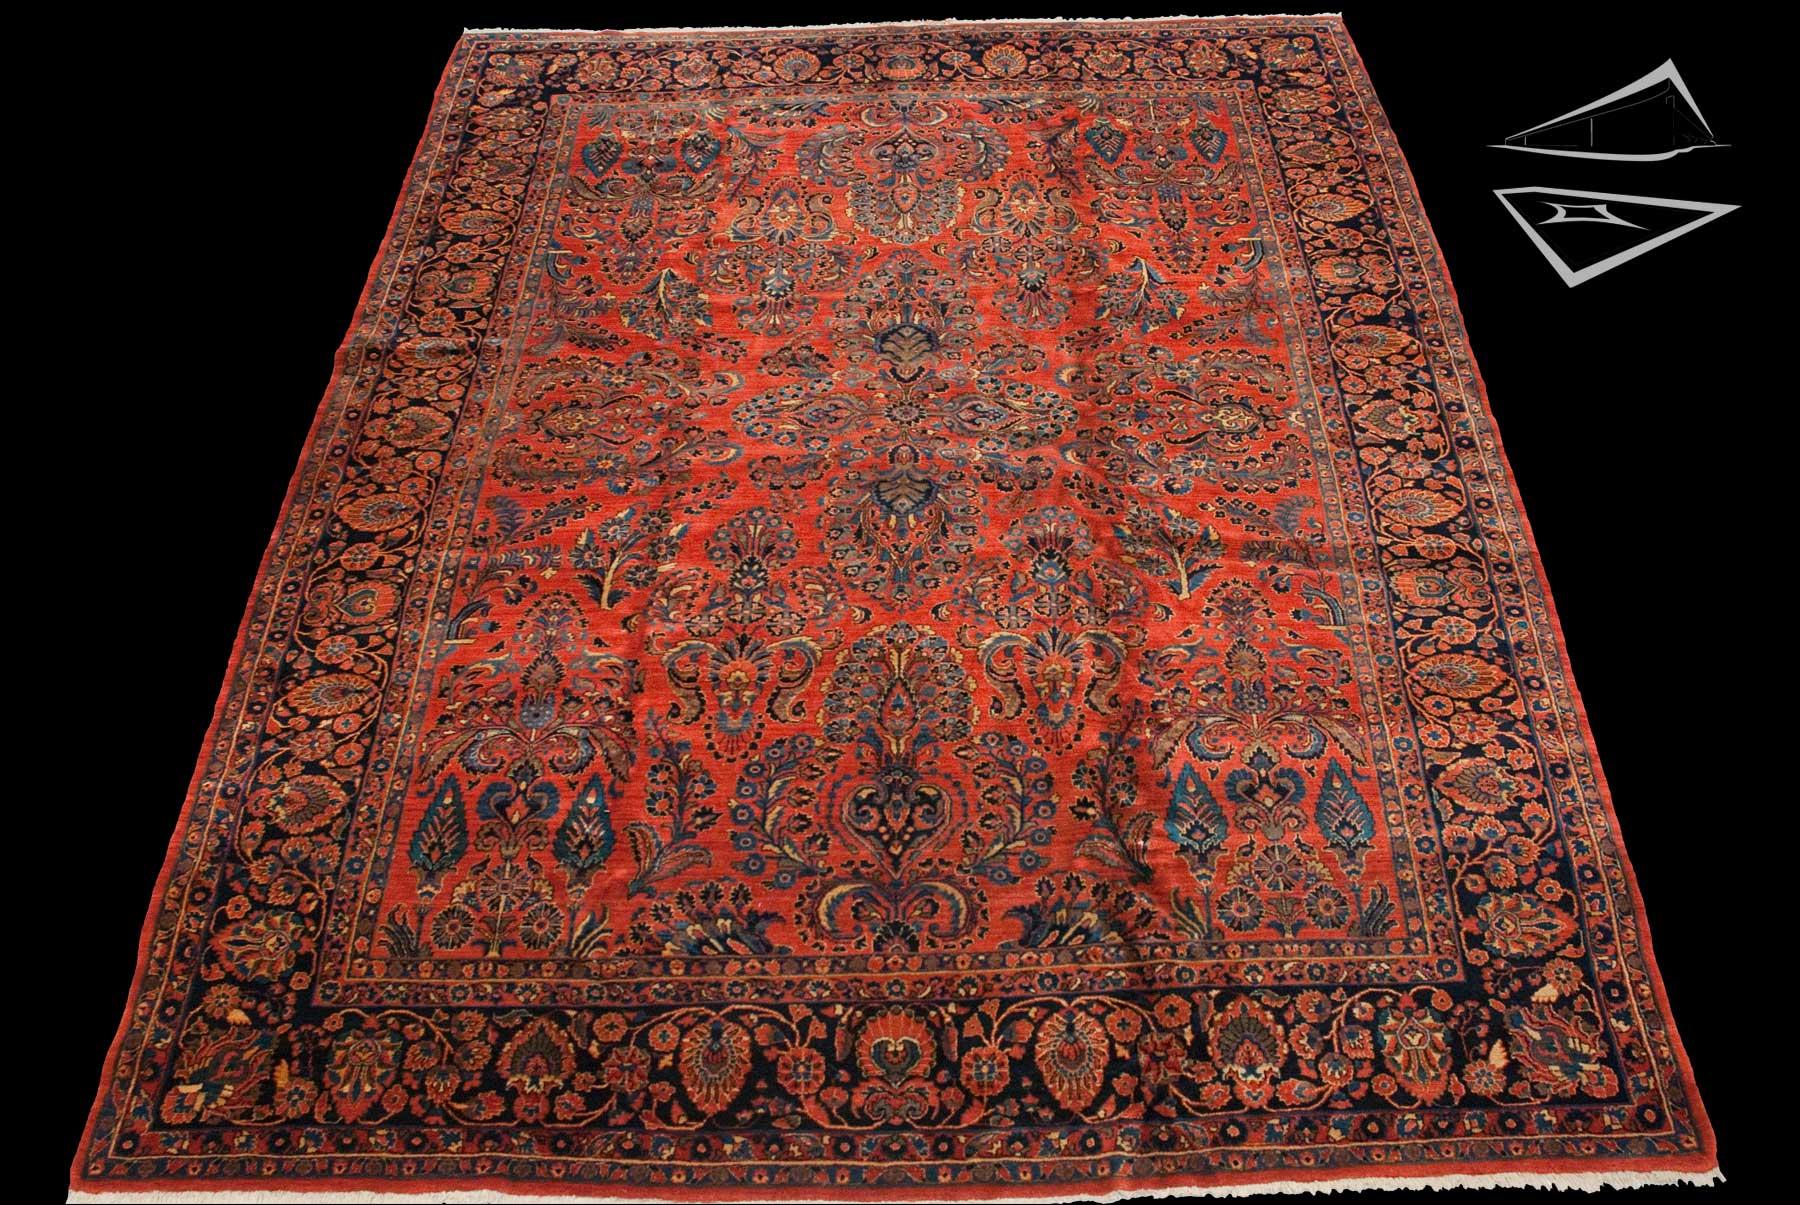 11x14 Persian Sarouk Rug Large Rugs Amp Carpets